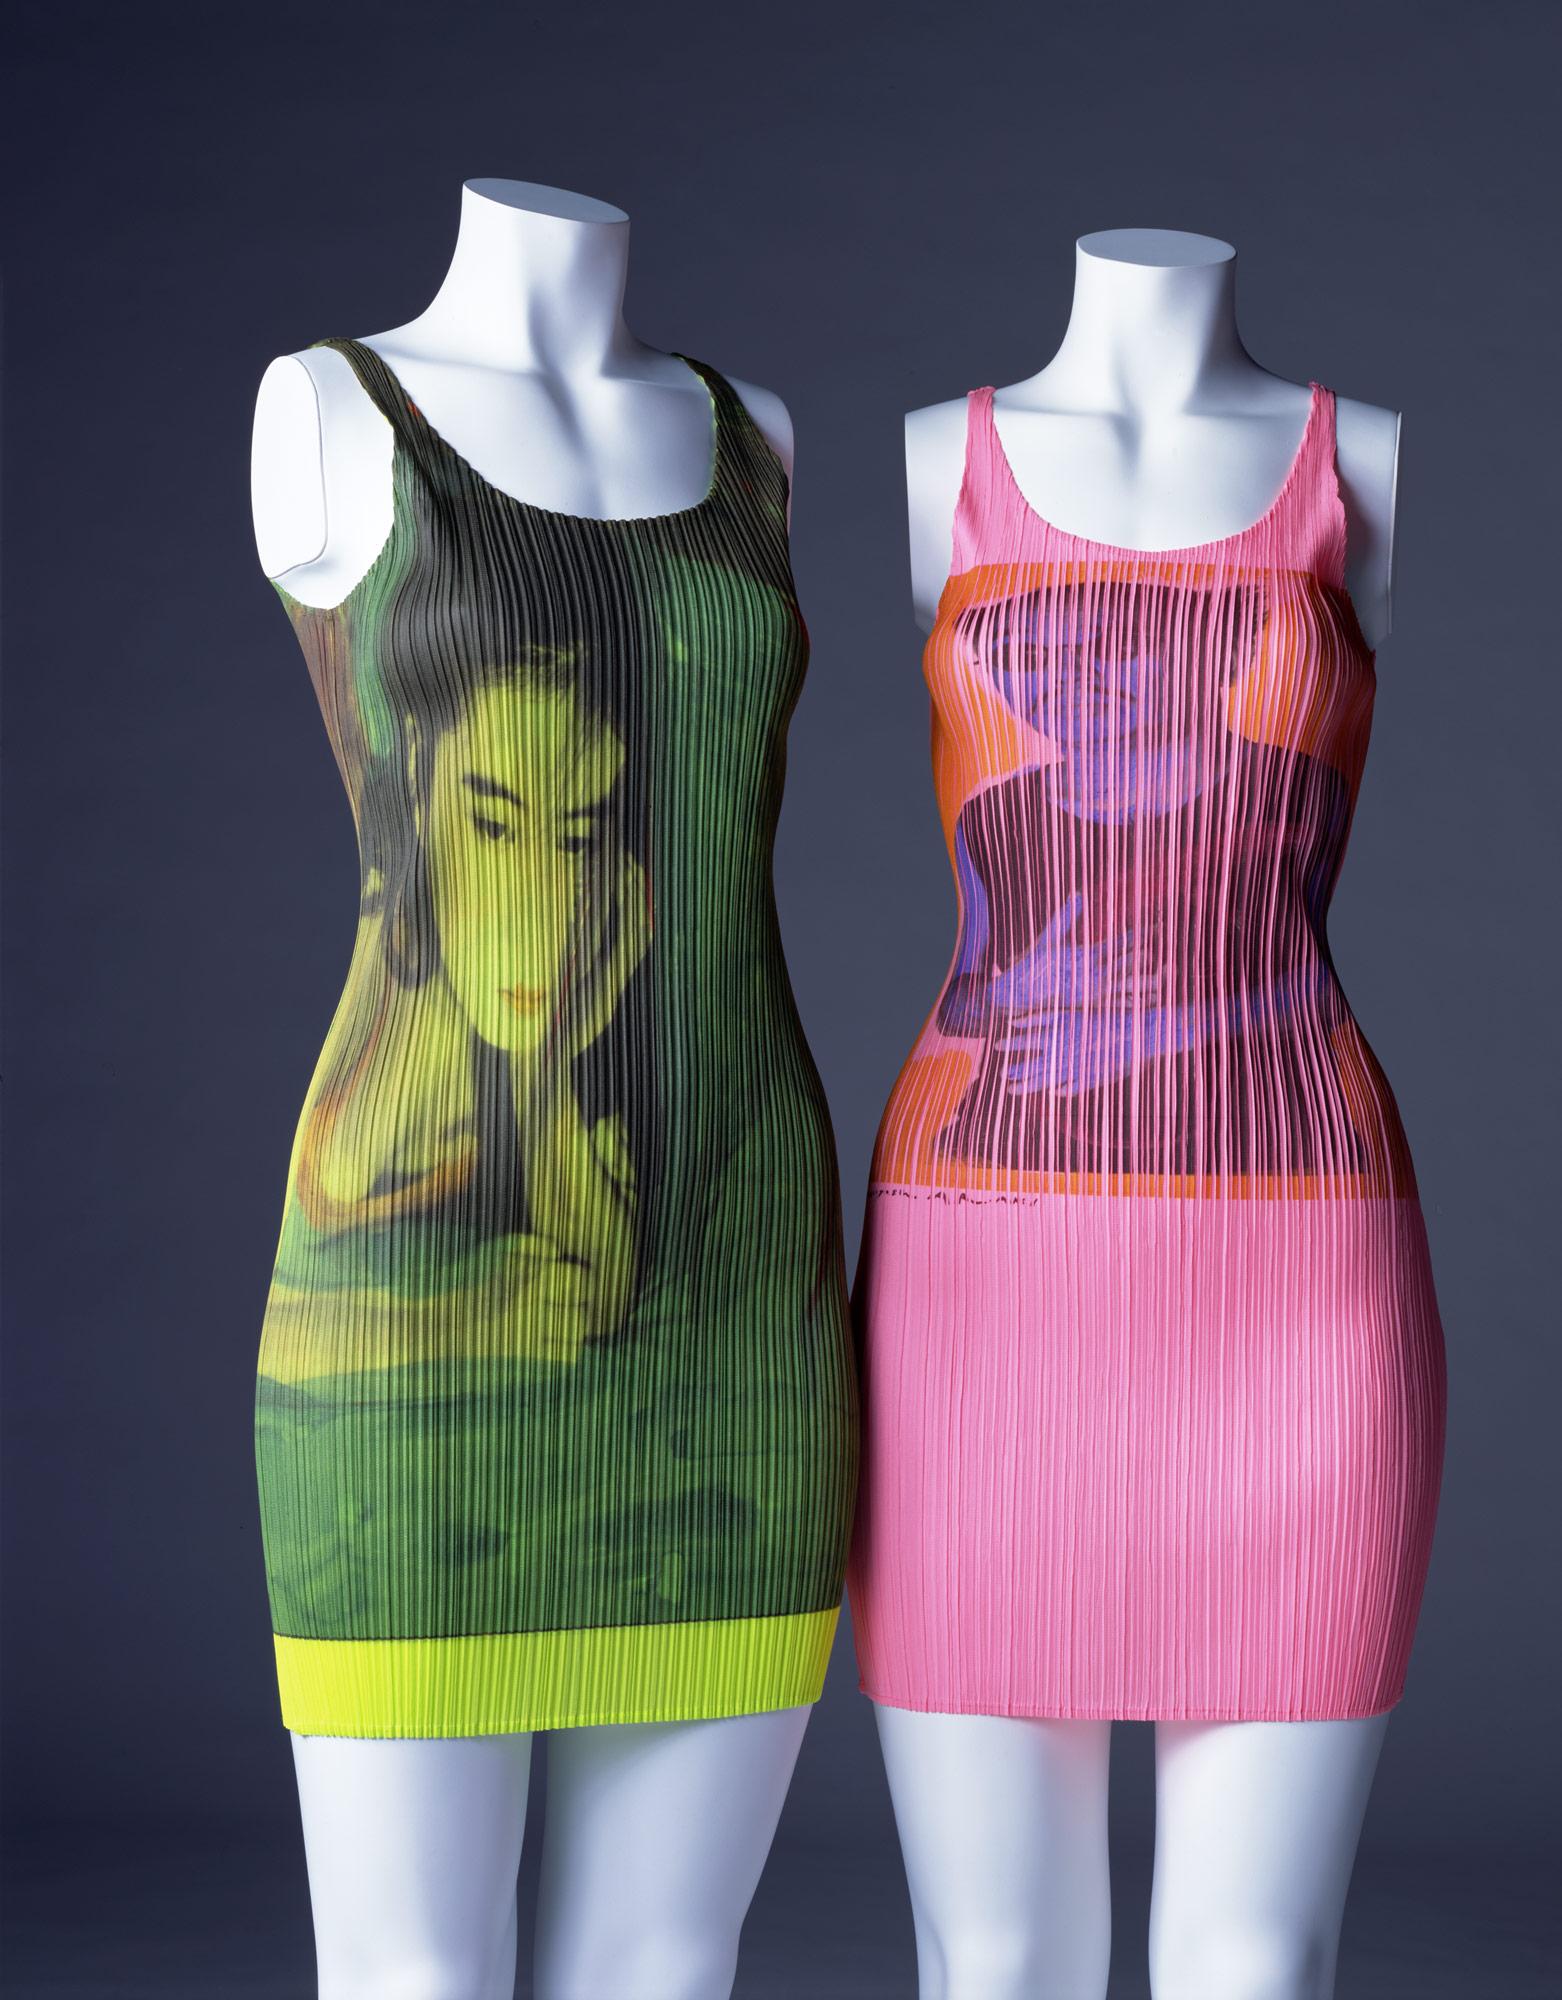 Dress [Left] Dress [Right]